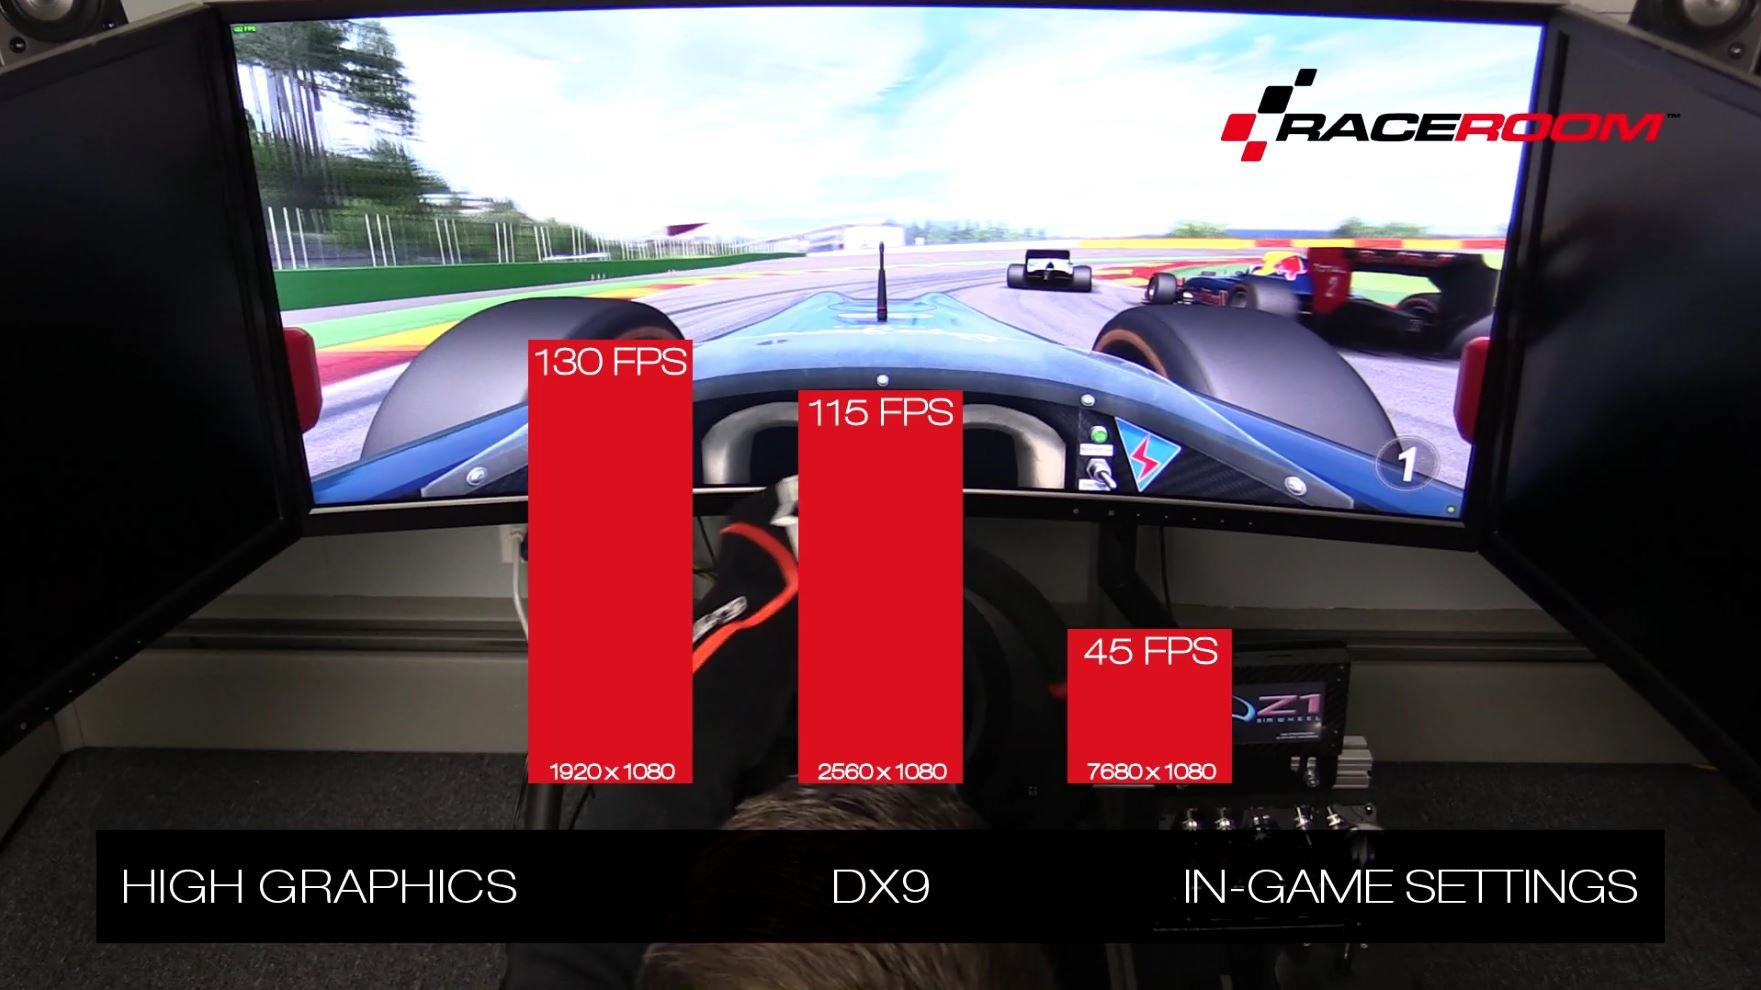 RaceRoom benchmark EVGA GTX 970 FTW+